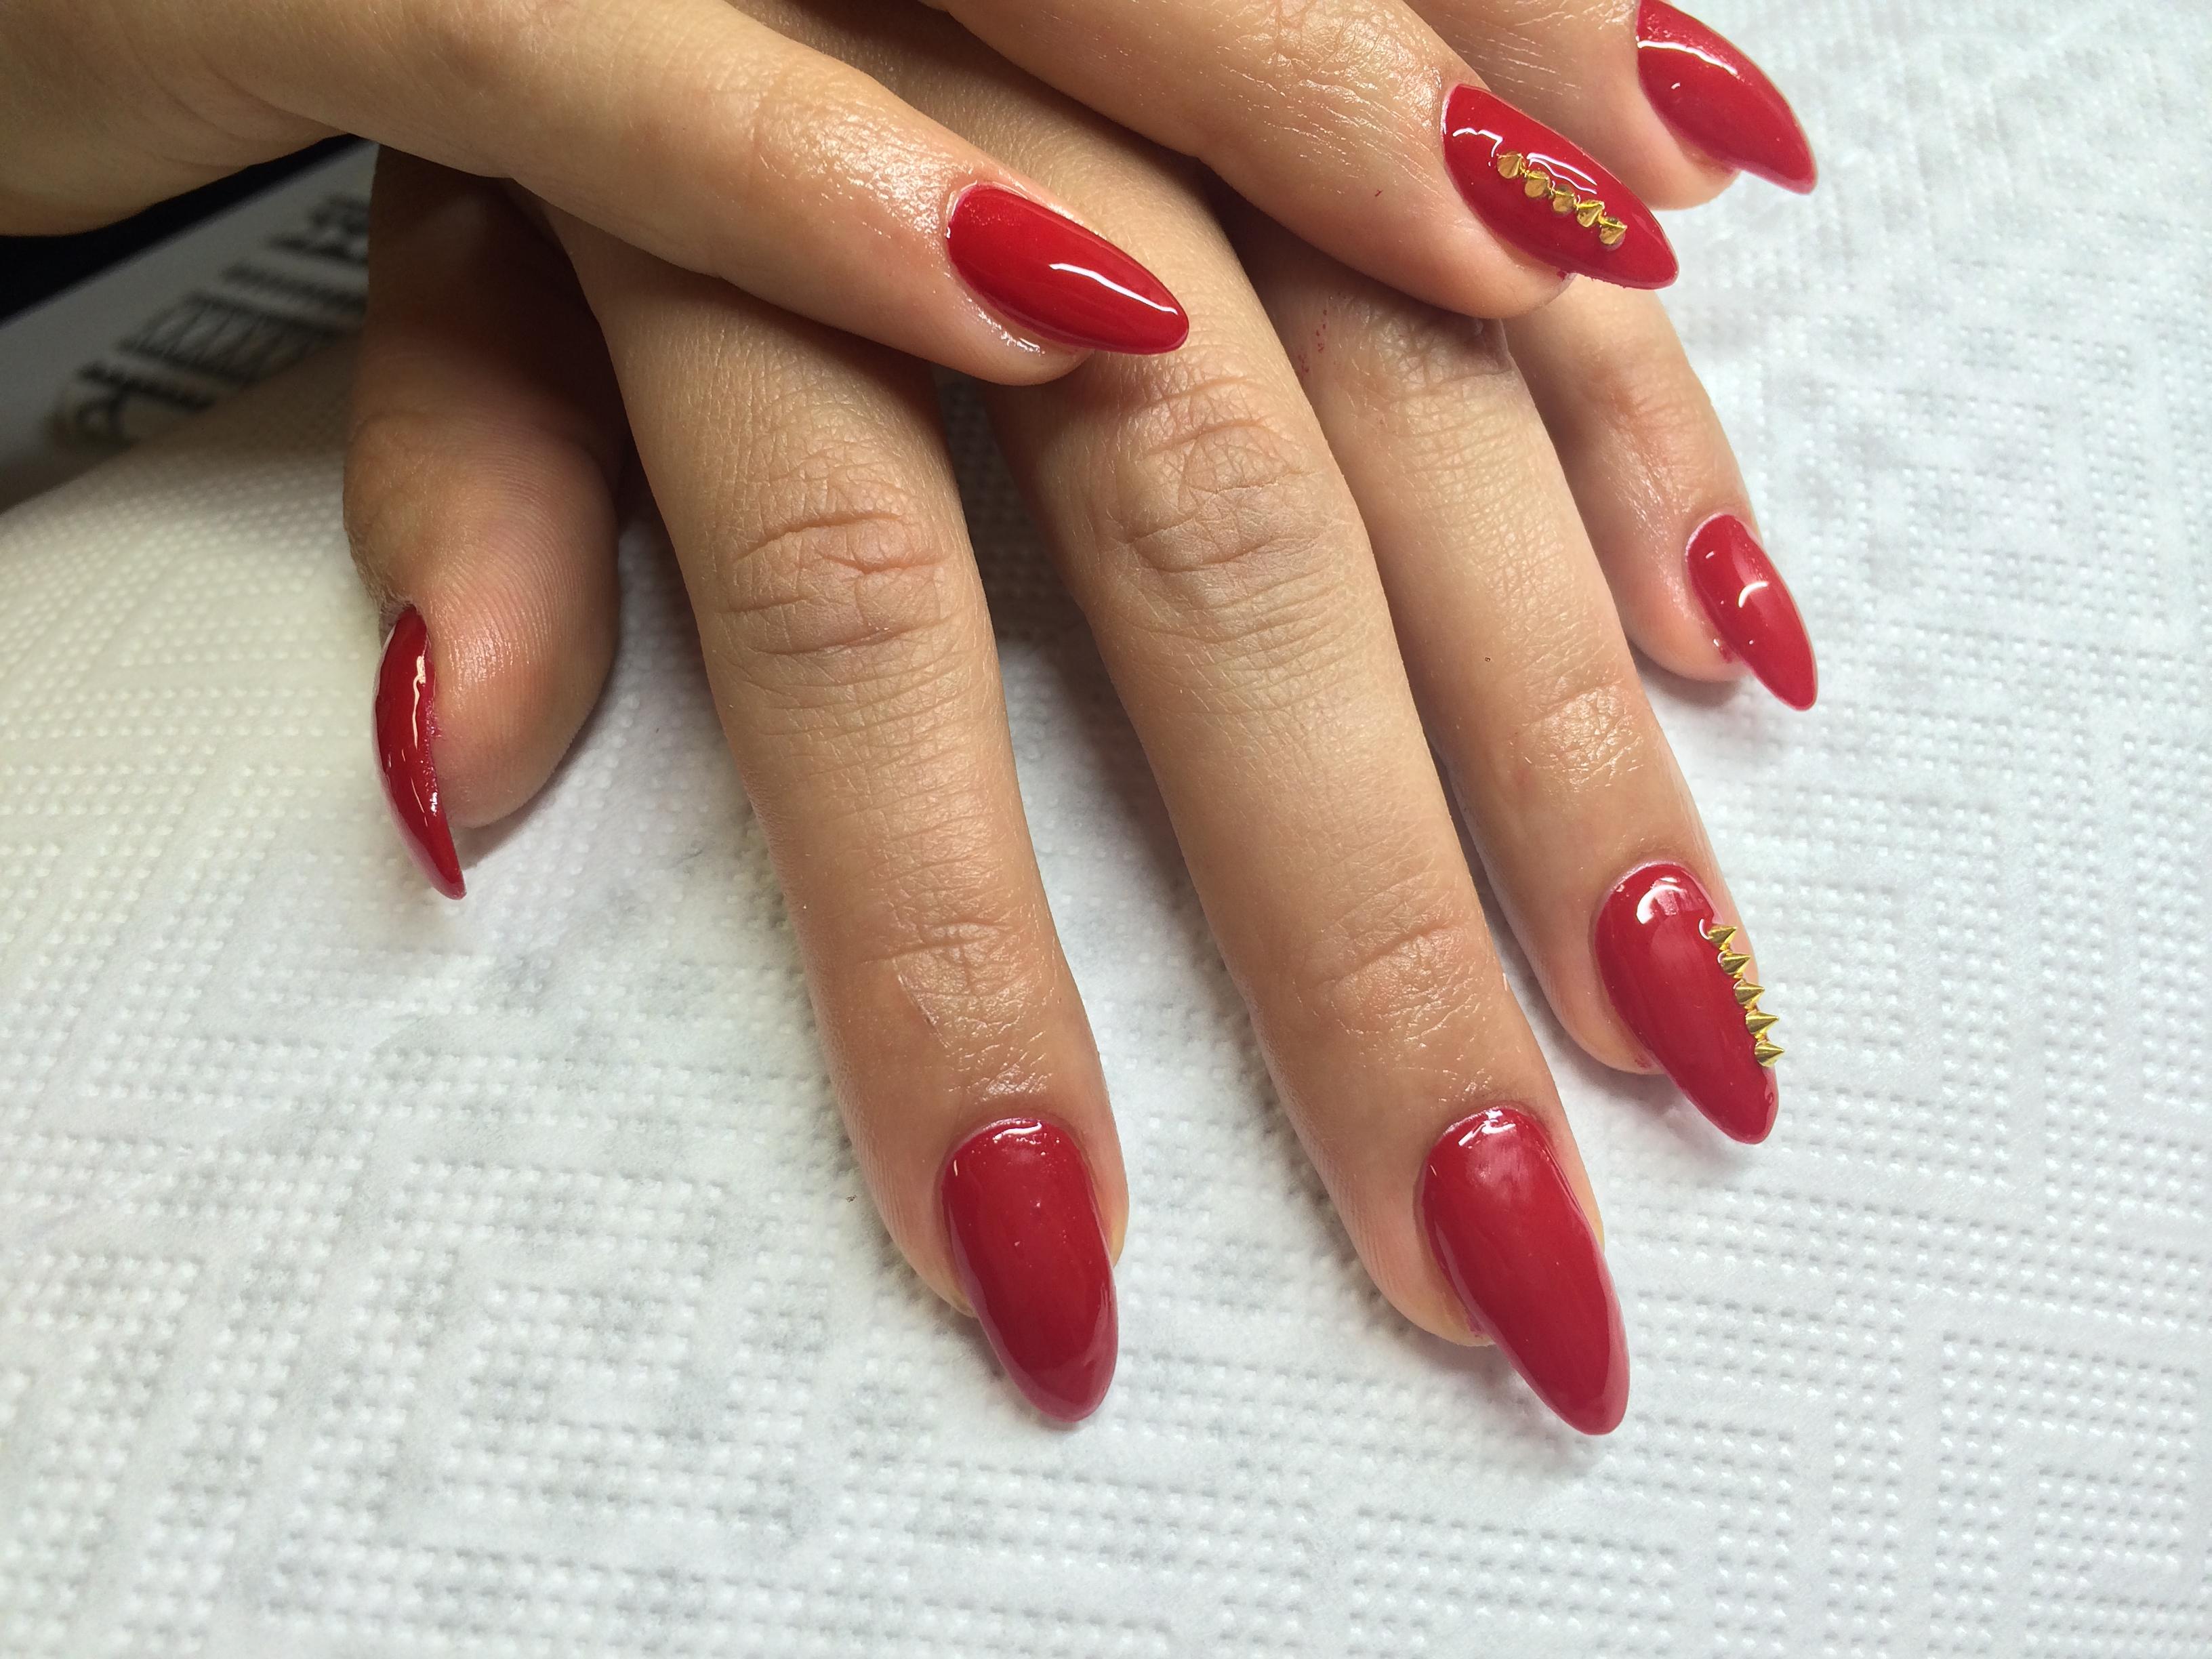 Nagelstudio Nageldesign Nageldesignering Nagelstyling Bei Brill Nails